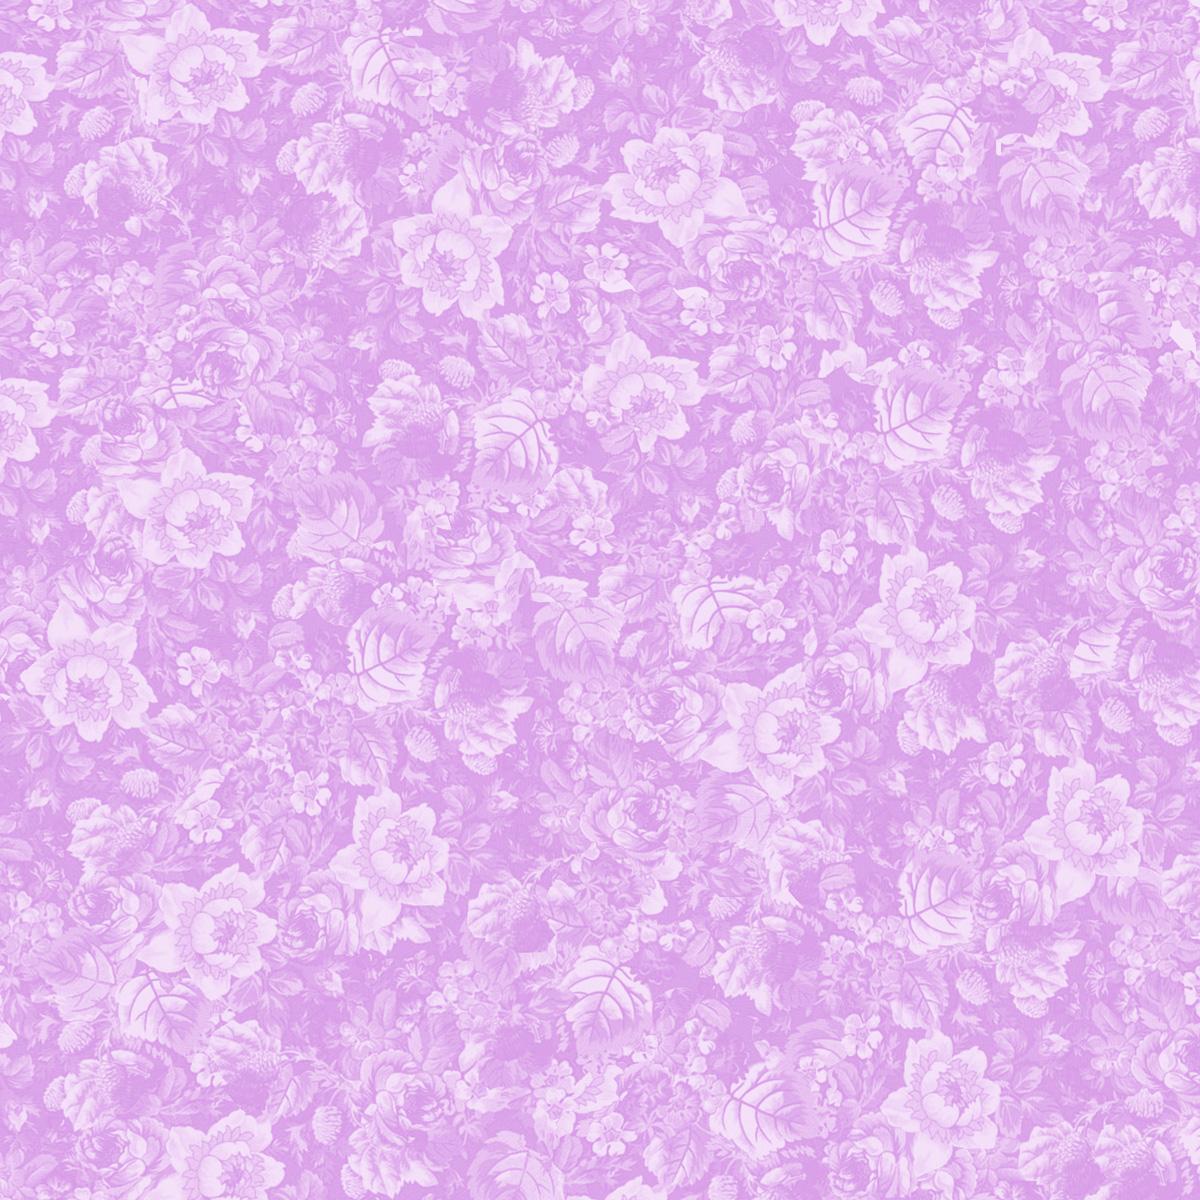 GRANNY ENCHANTED'S BLOG: Free Purple Fluff Digi Scrapbook ...